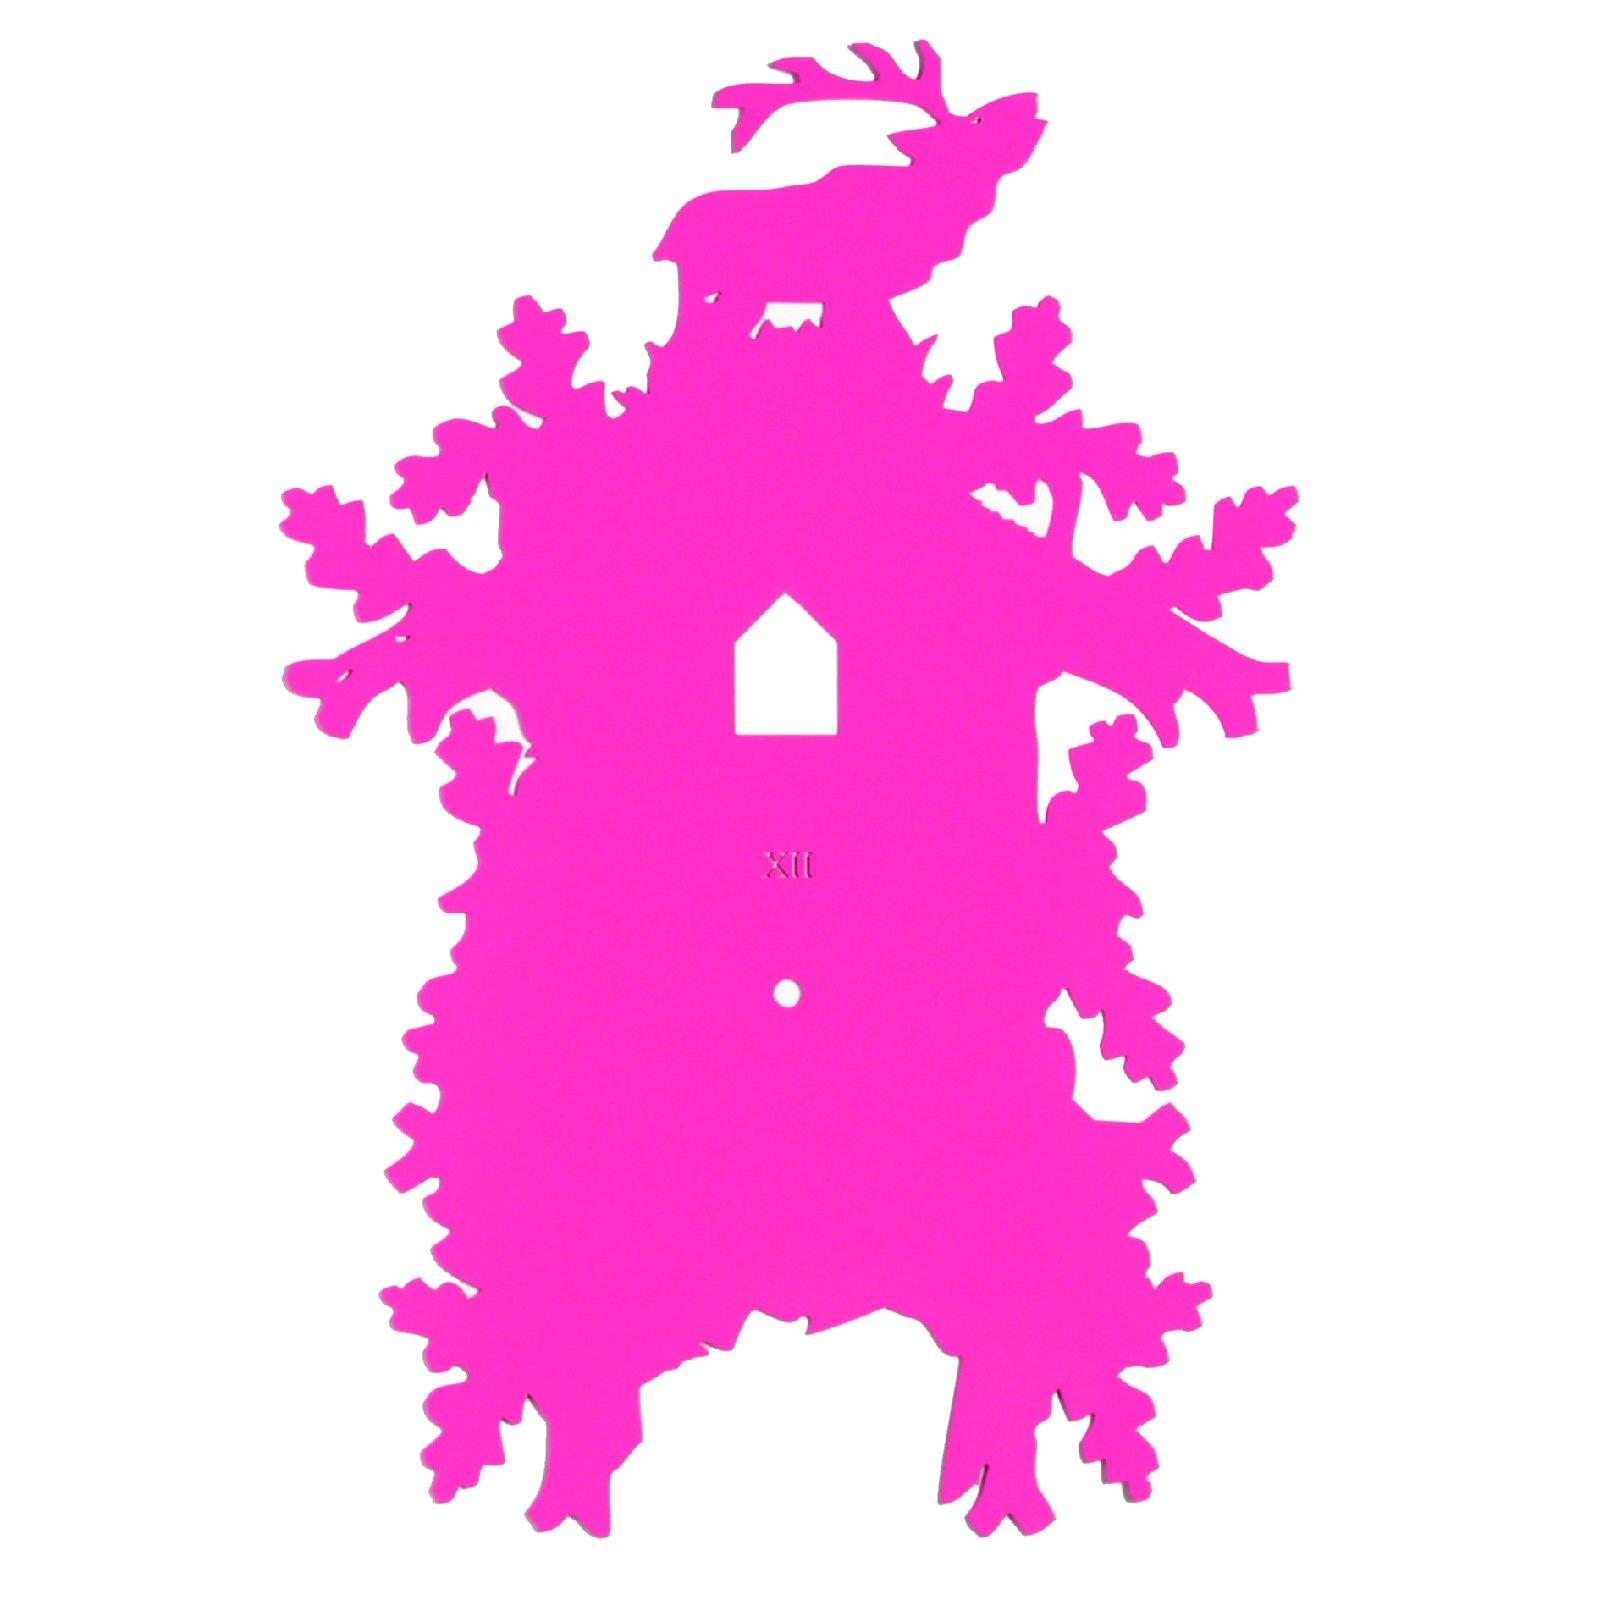 pimp up front kuckucksuhr pink hirsch wanduhr uhr. Black Bedroom Furniture Sets. Home Design Ideas